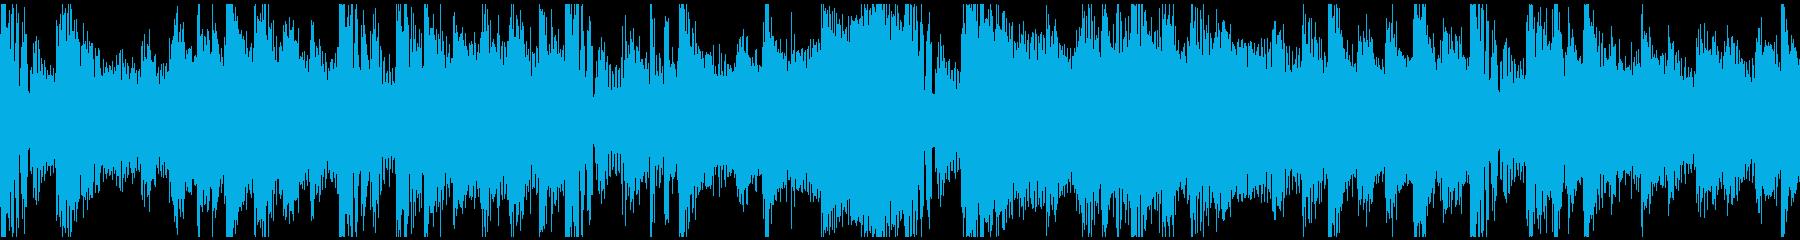 FutureBass_bpm156Looの再生済みの波形